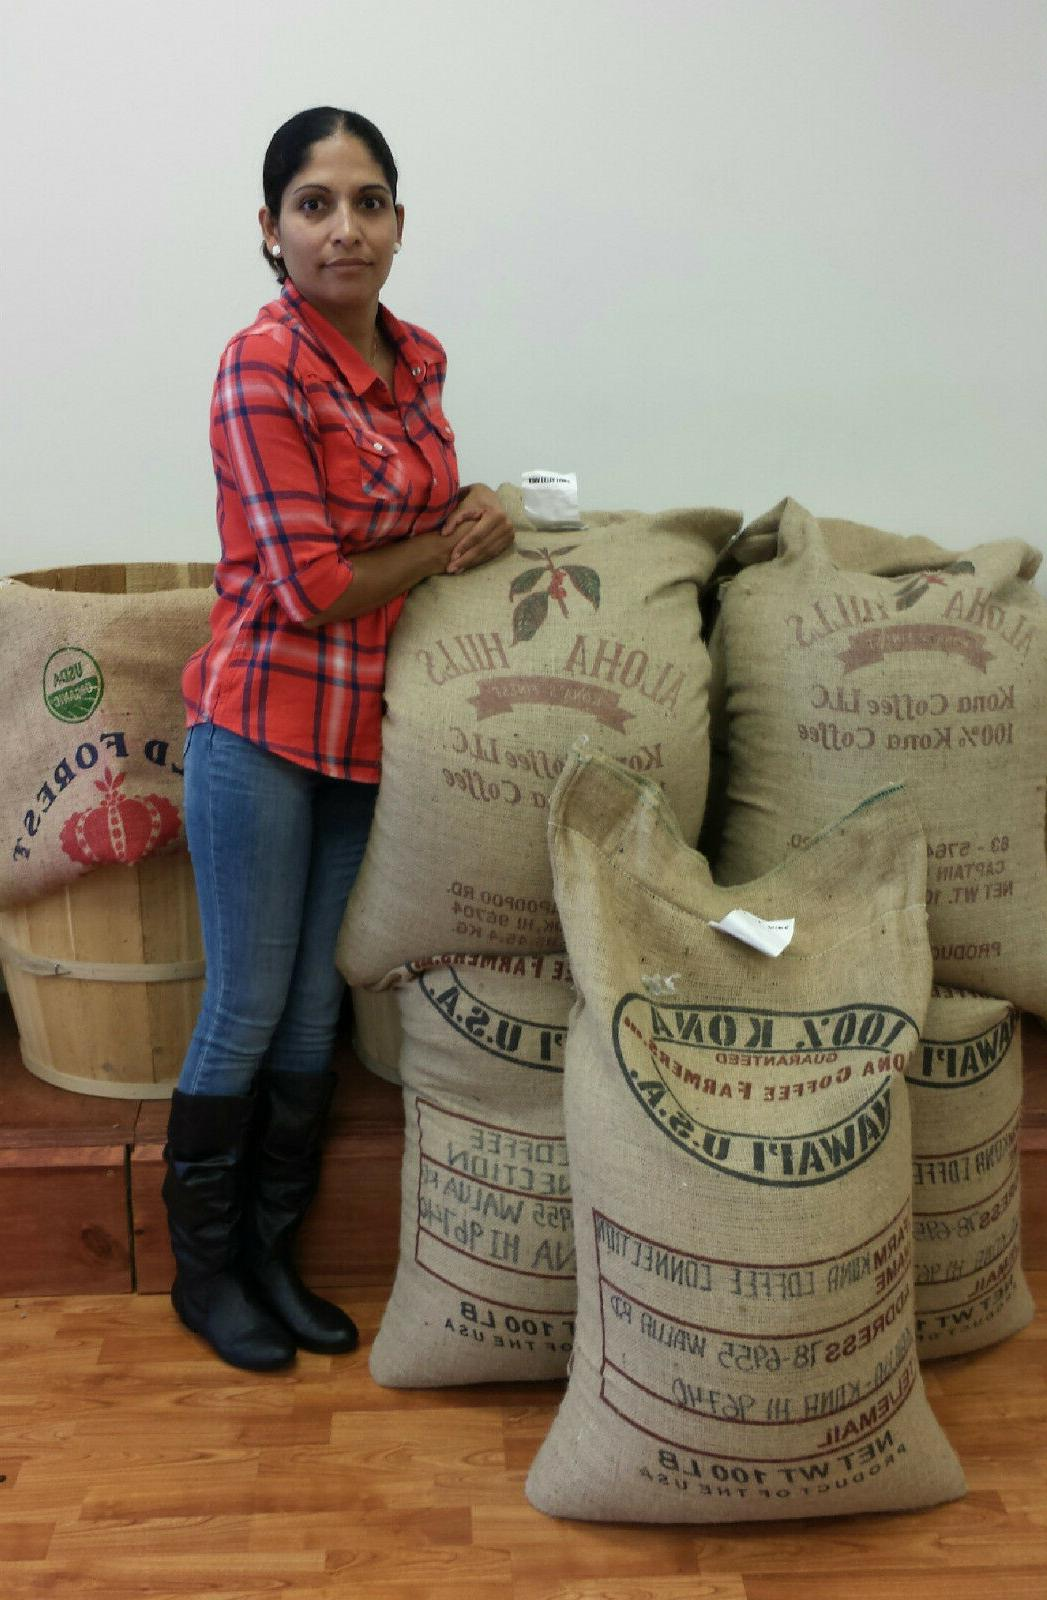 100 percent kona hawaiian whole coffee beans